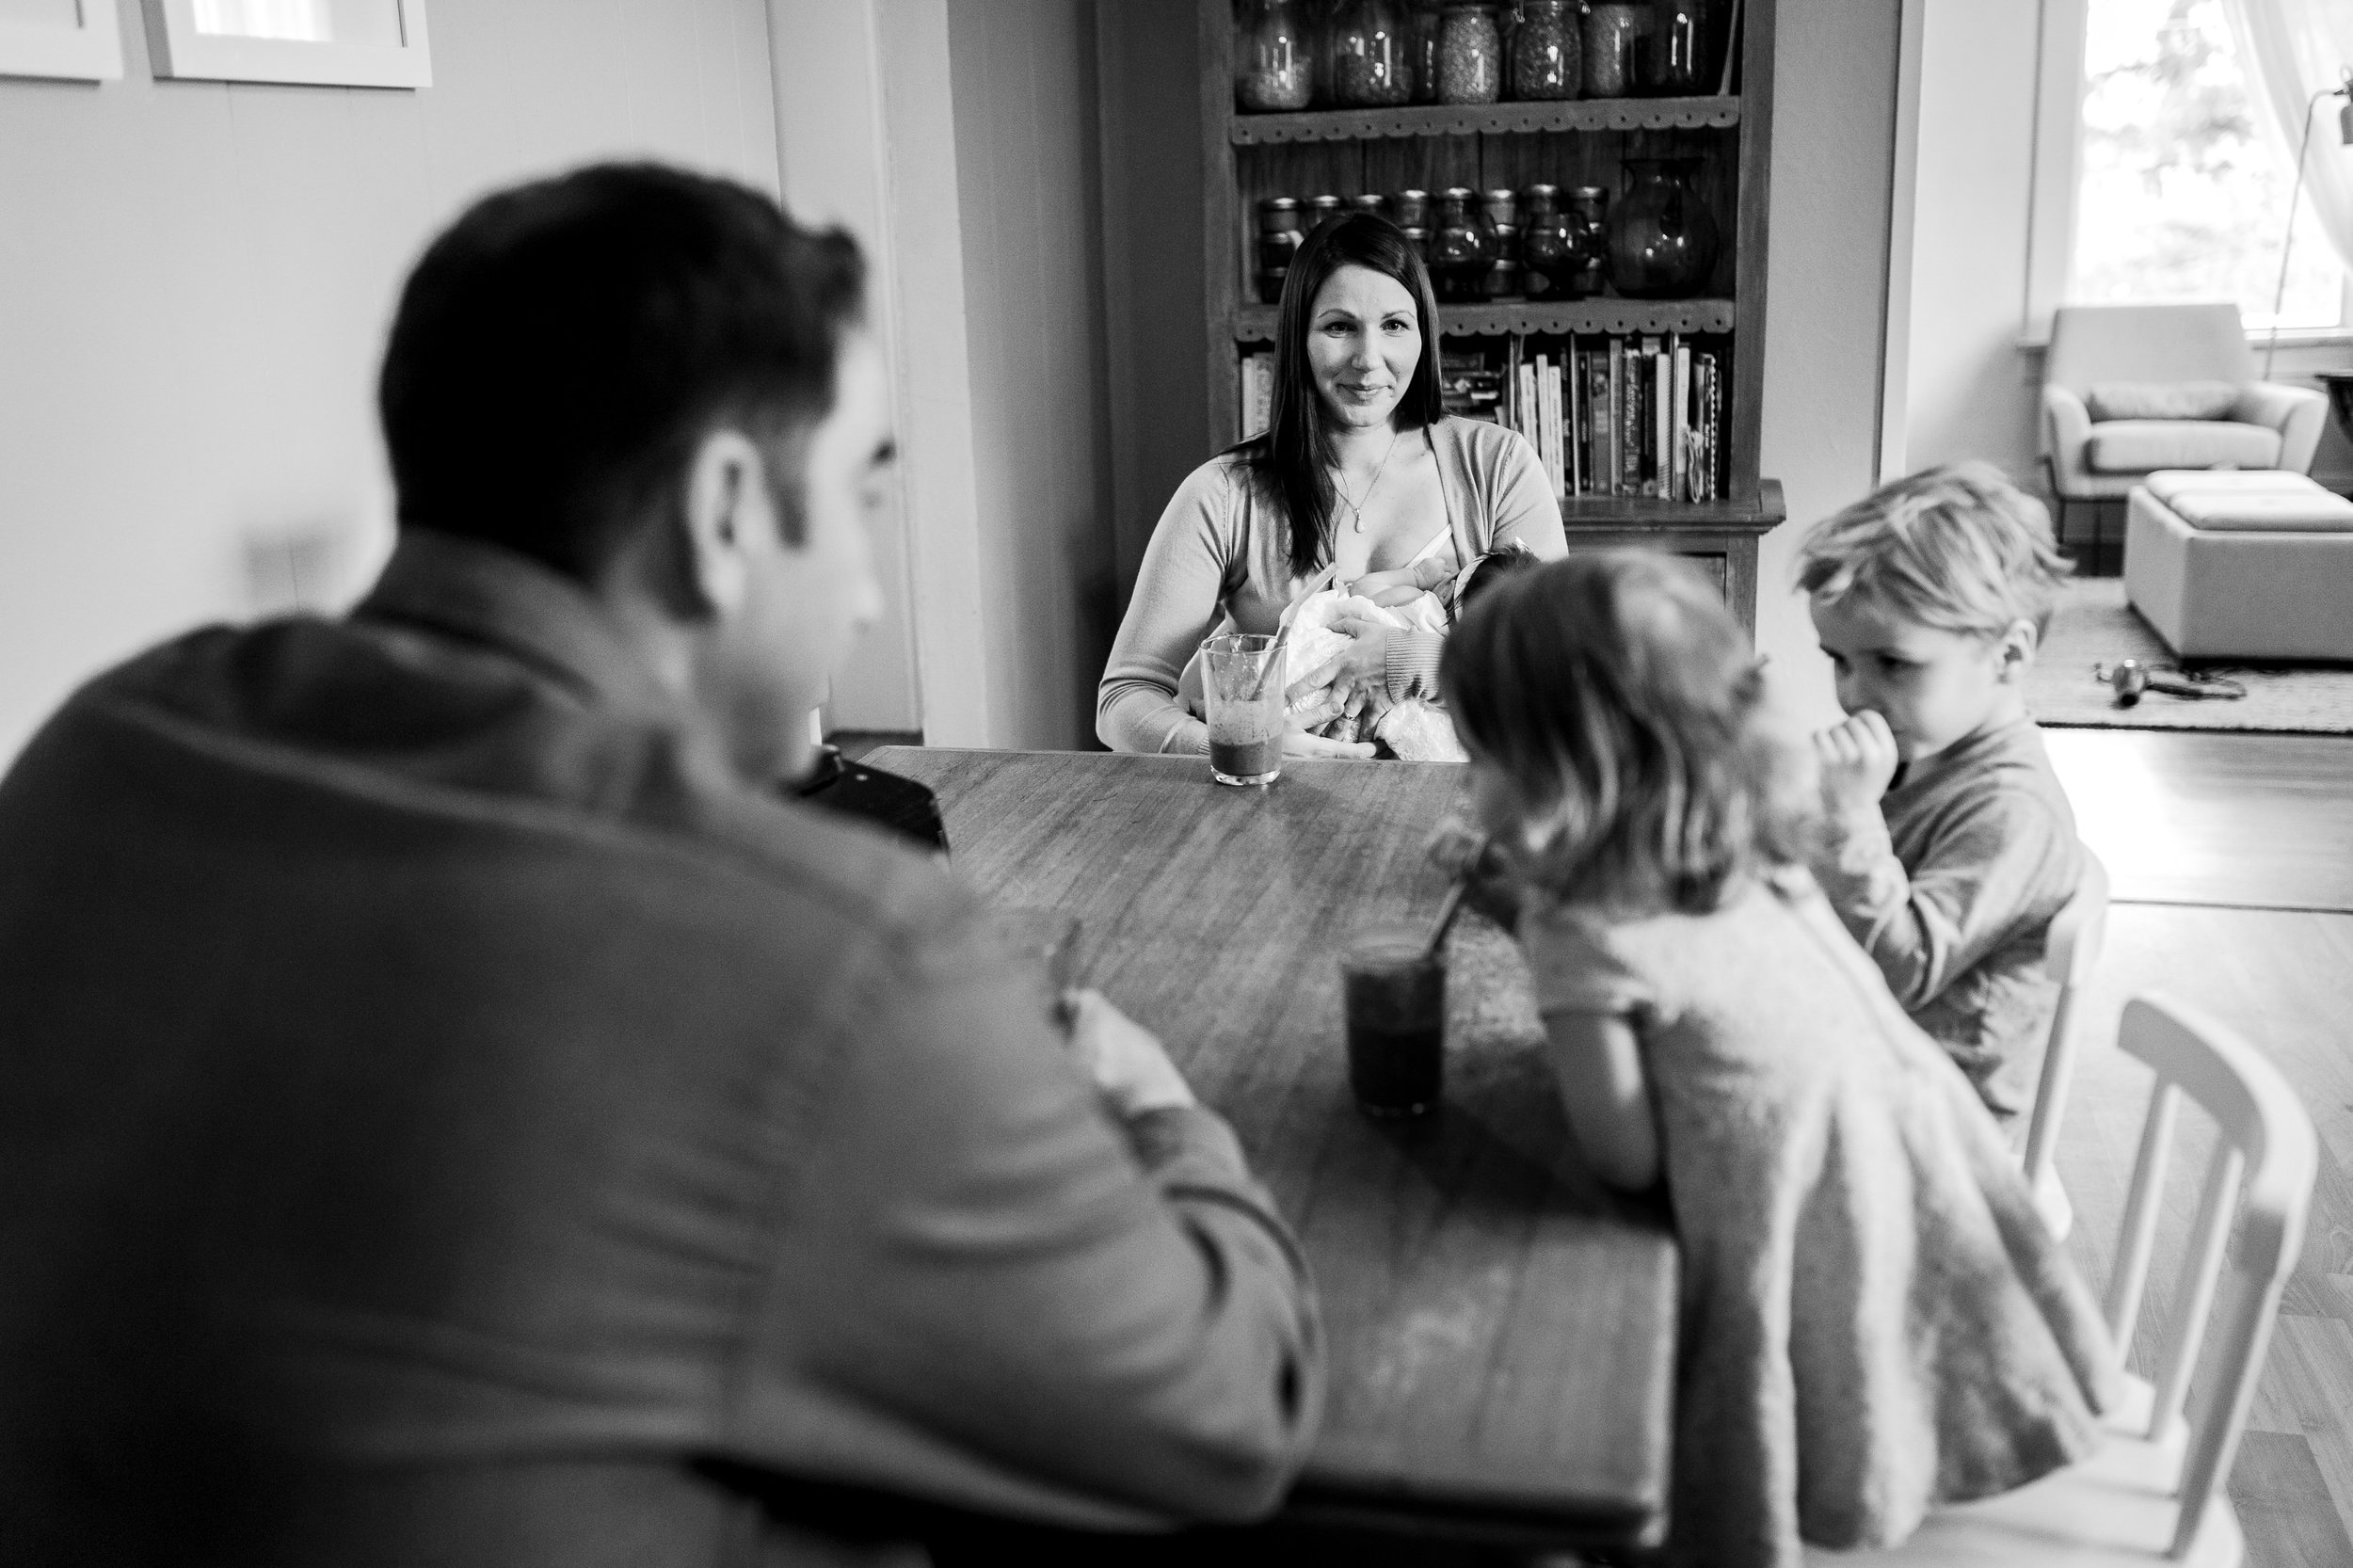 smoothie-kids-blentec-documentary-family-mom-photography-smile